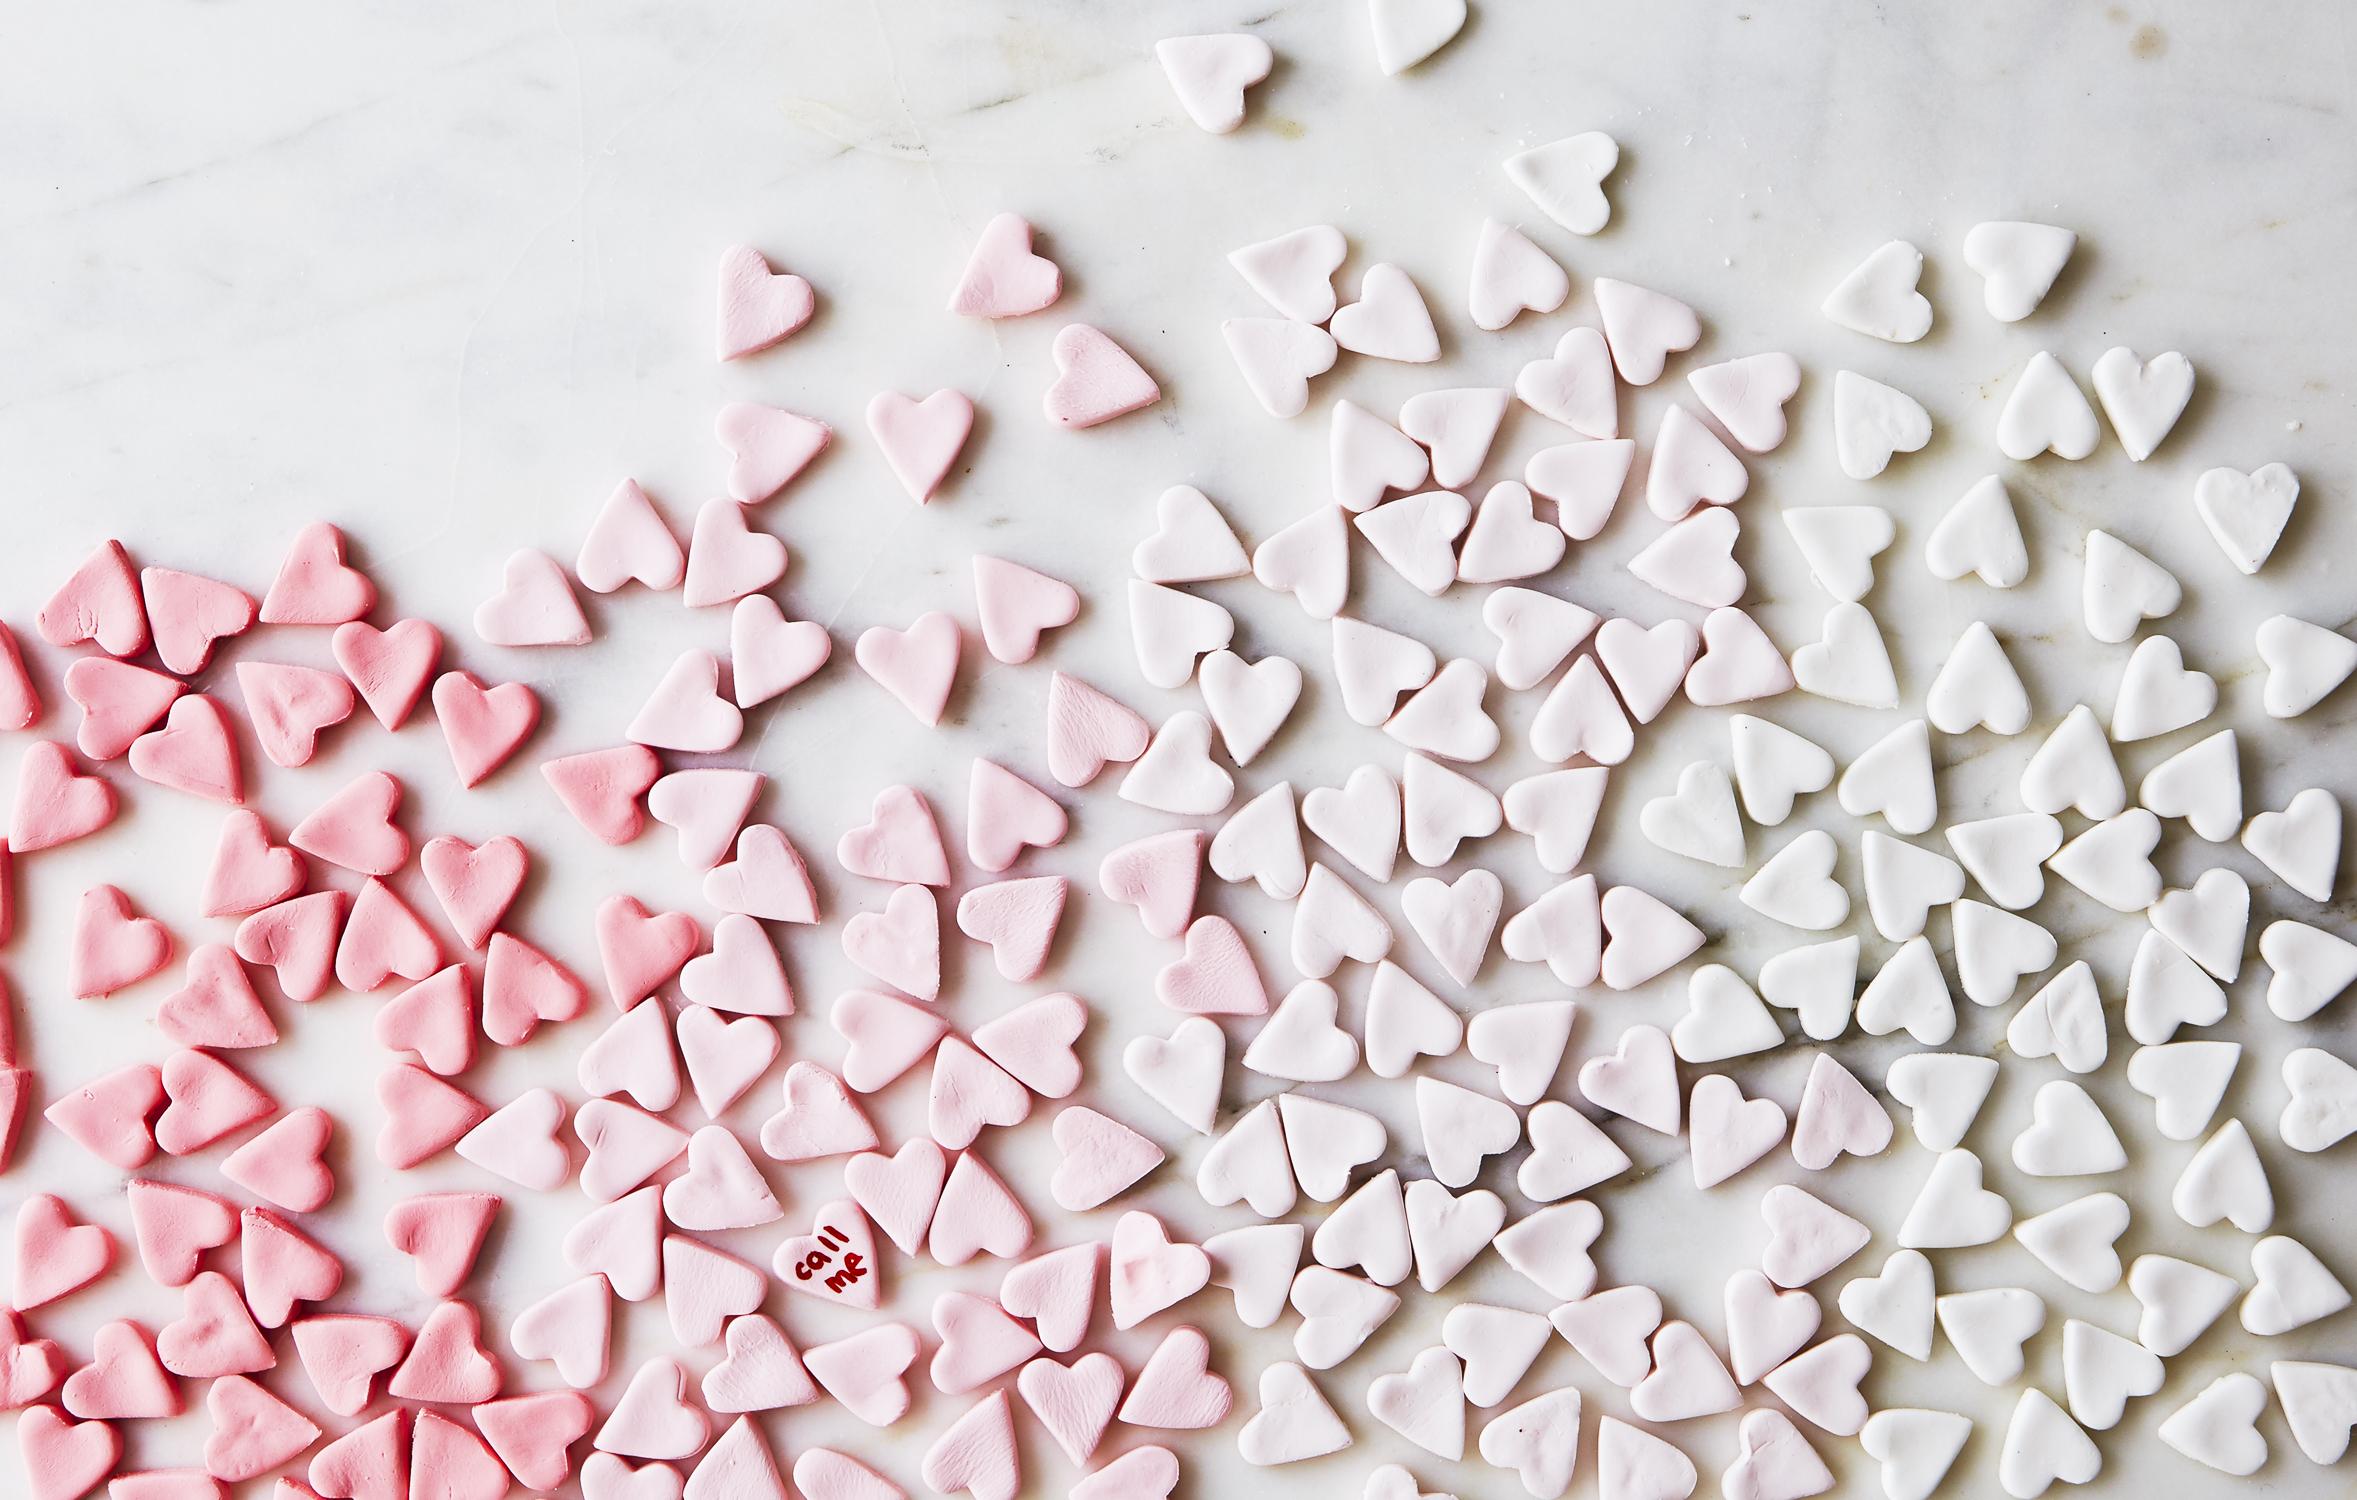 pg23-24_2016-0118_baking-basics-how-to-make-conversation-hearts-valentines-day_bobbi-lin_16473.jpg